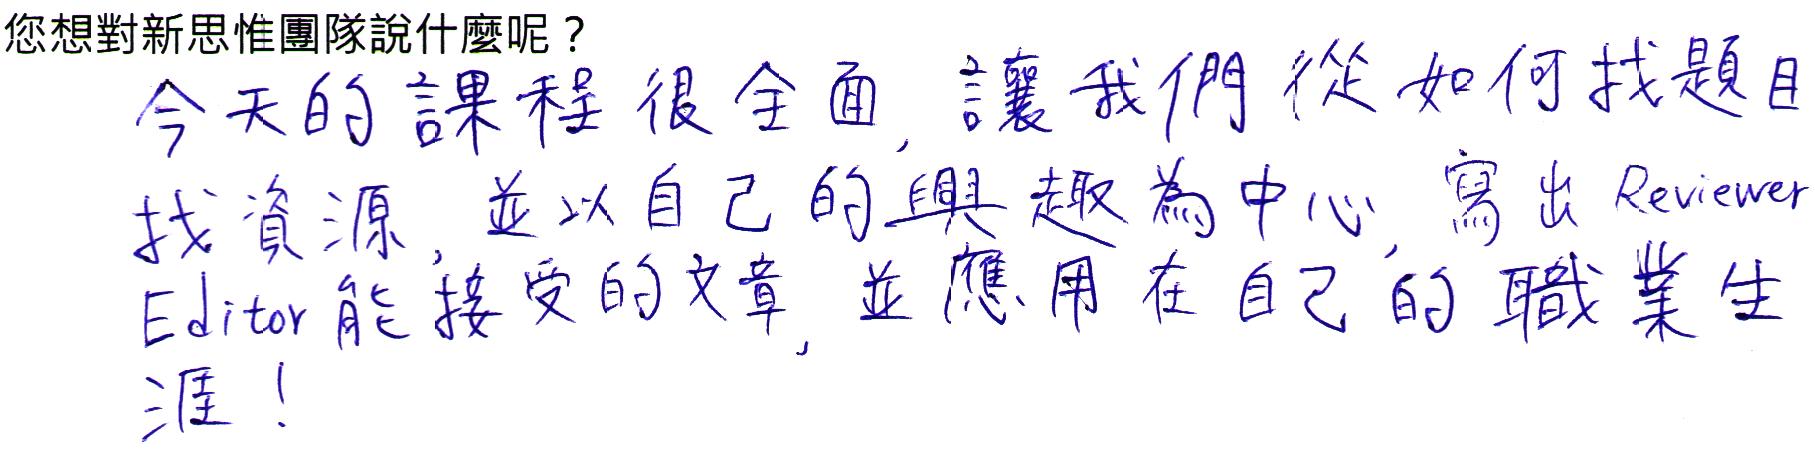 20170924_YMRF_feedback_00016